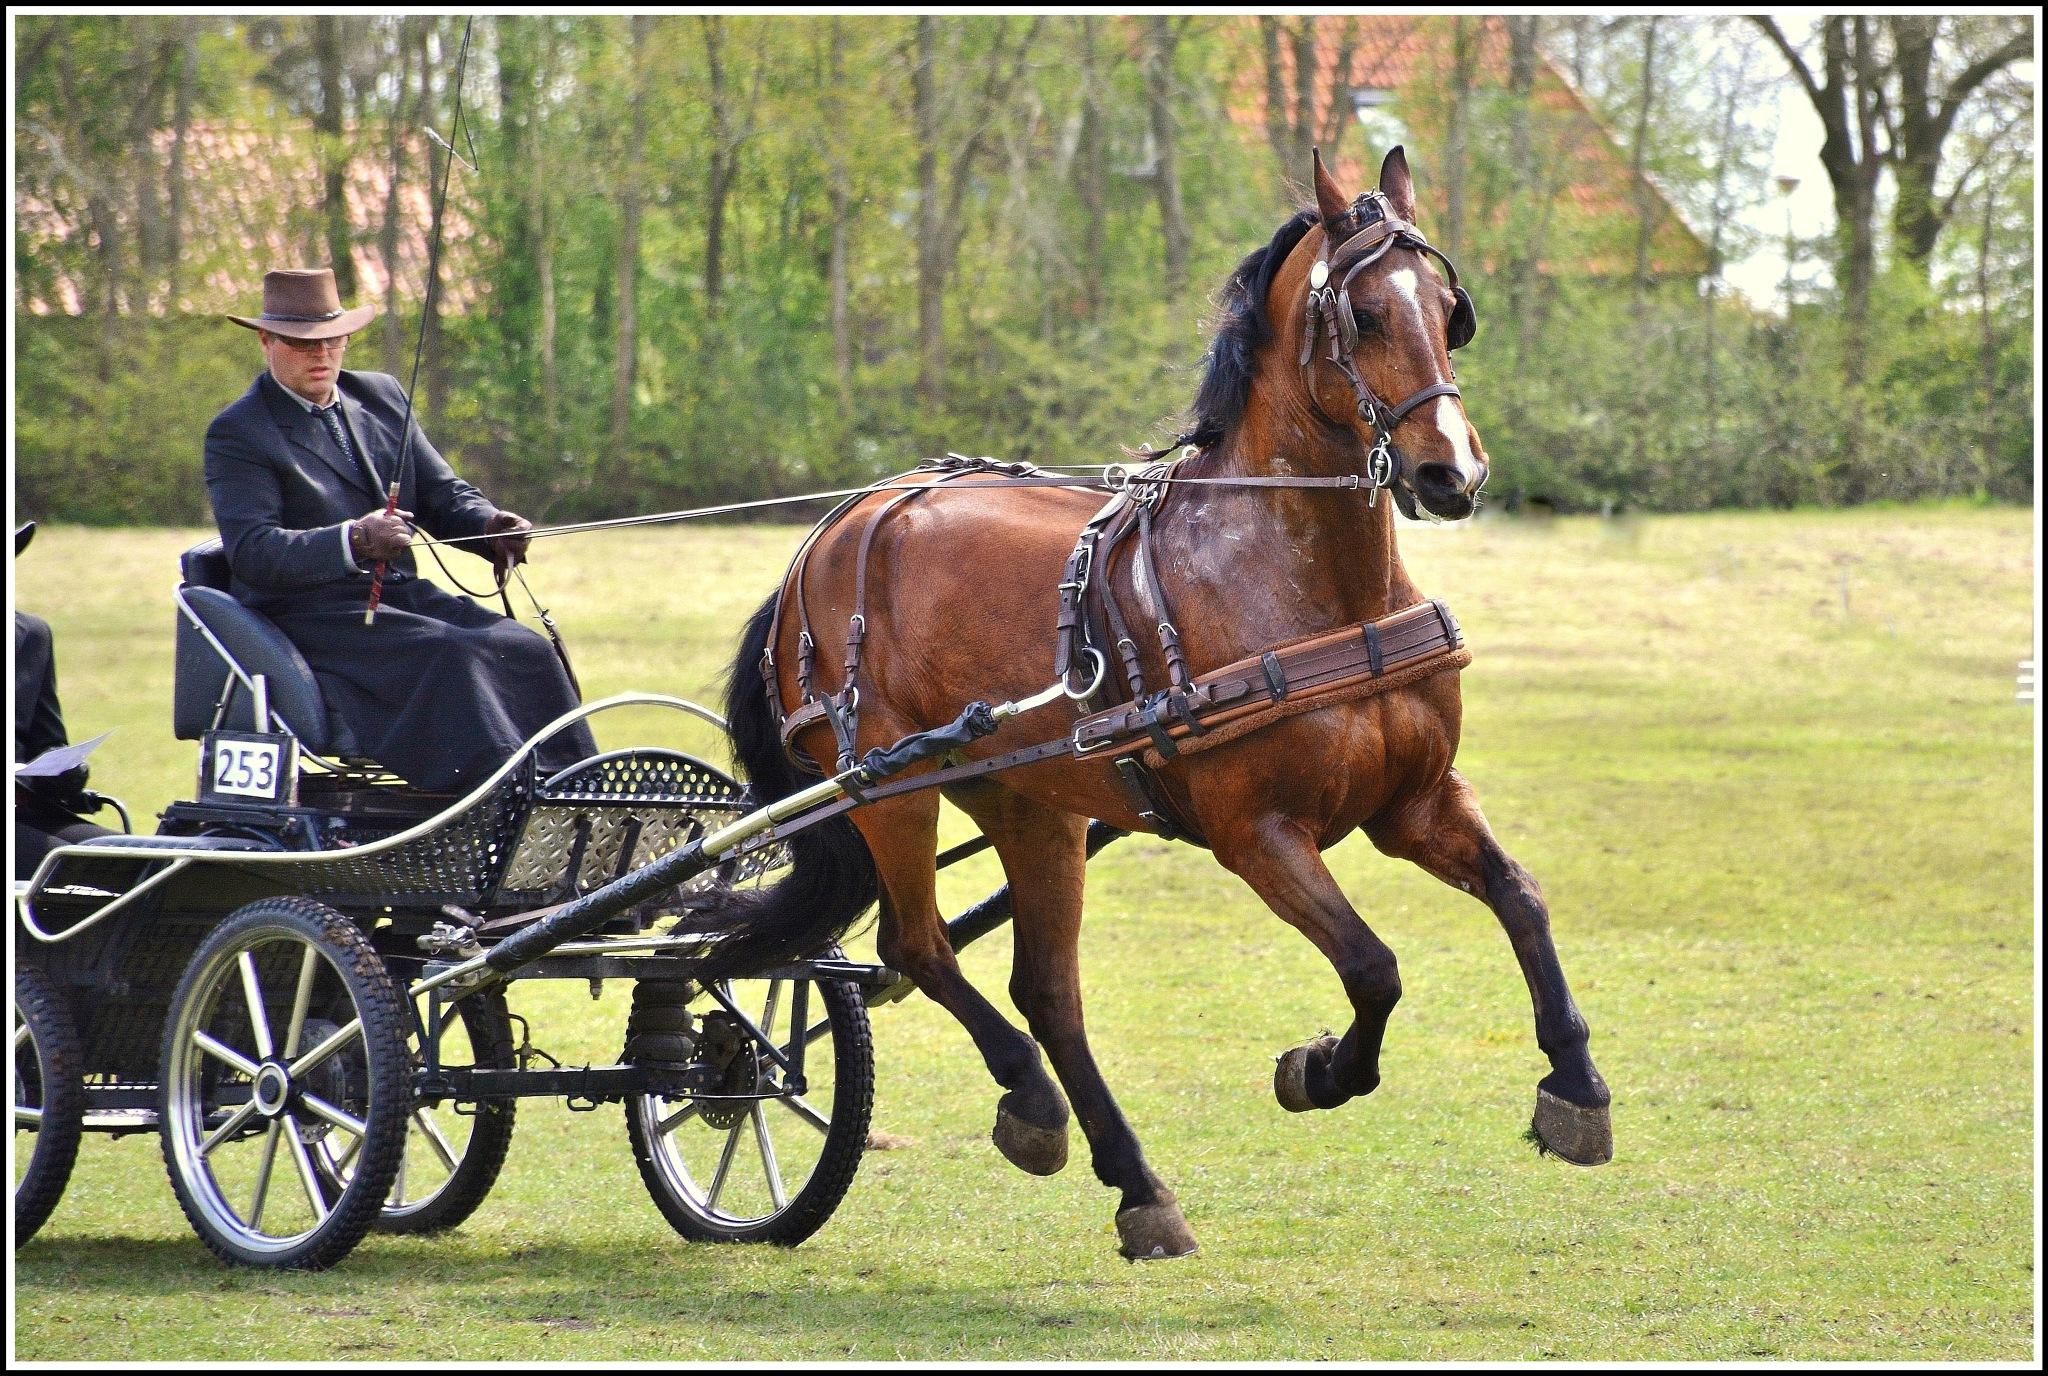 Big horsejump ! by Jacob van der Veen